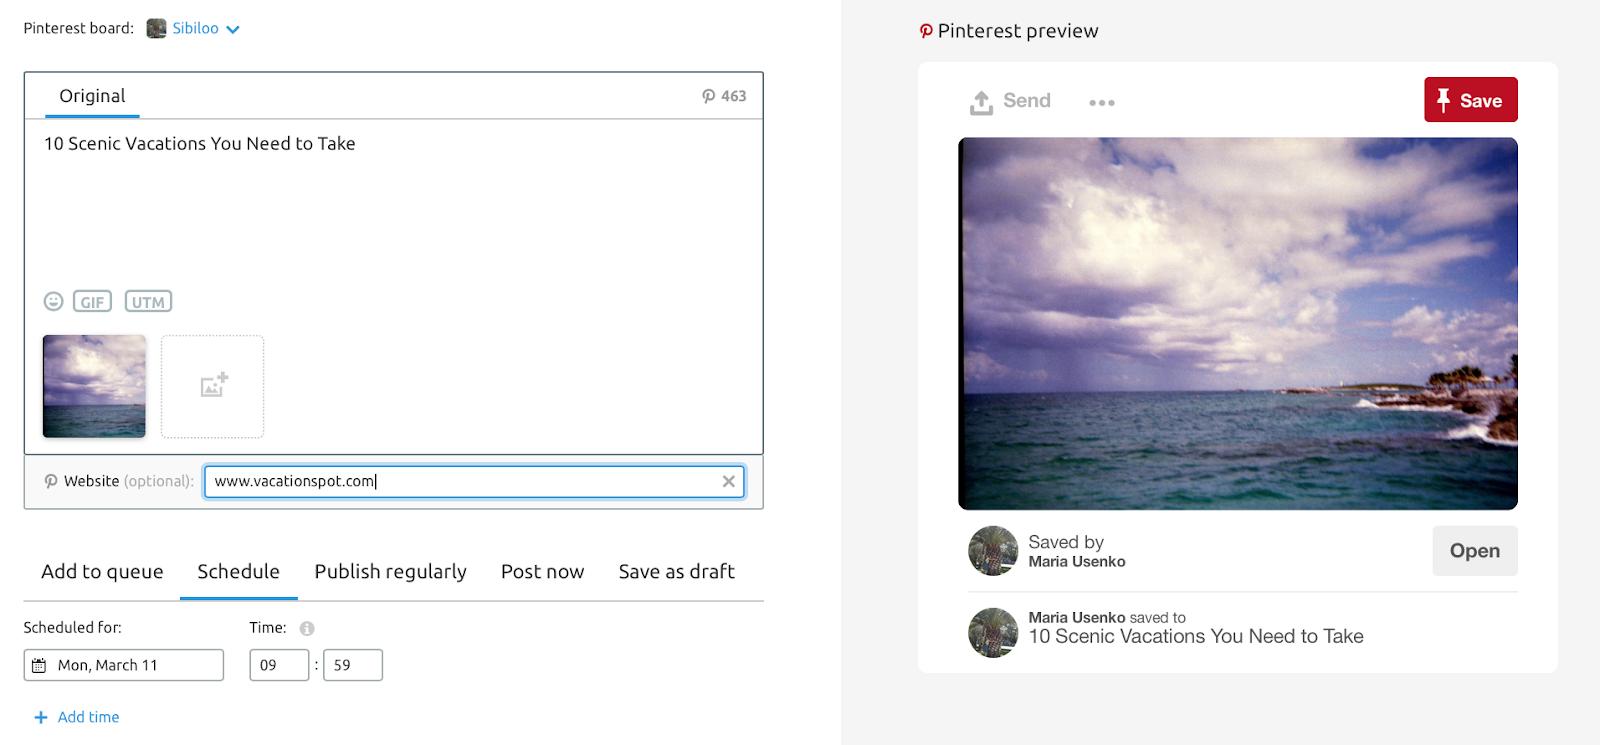 Herramientas para social media - Enlazar URLs a pines